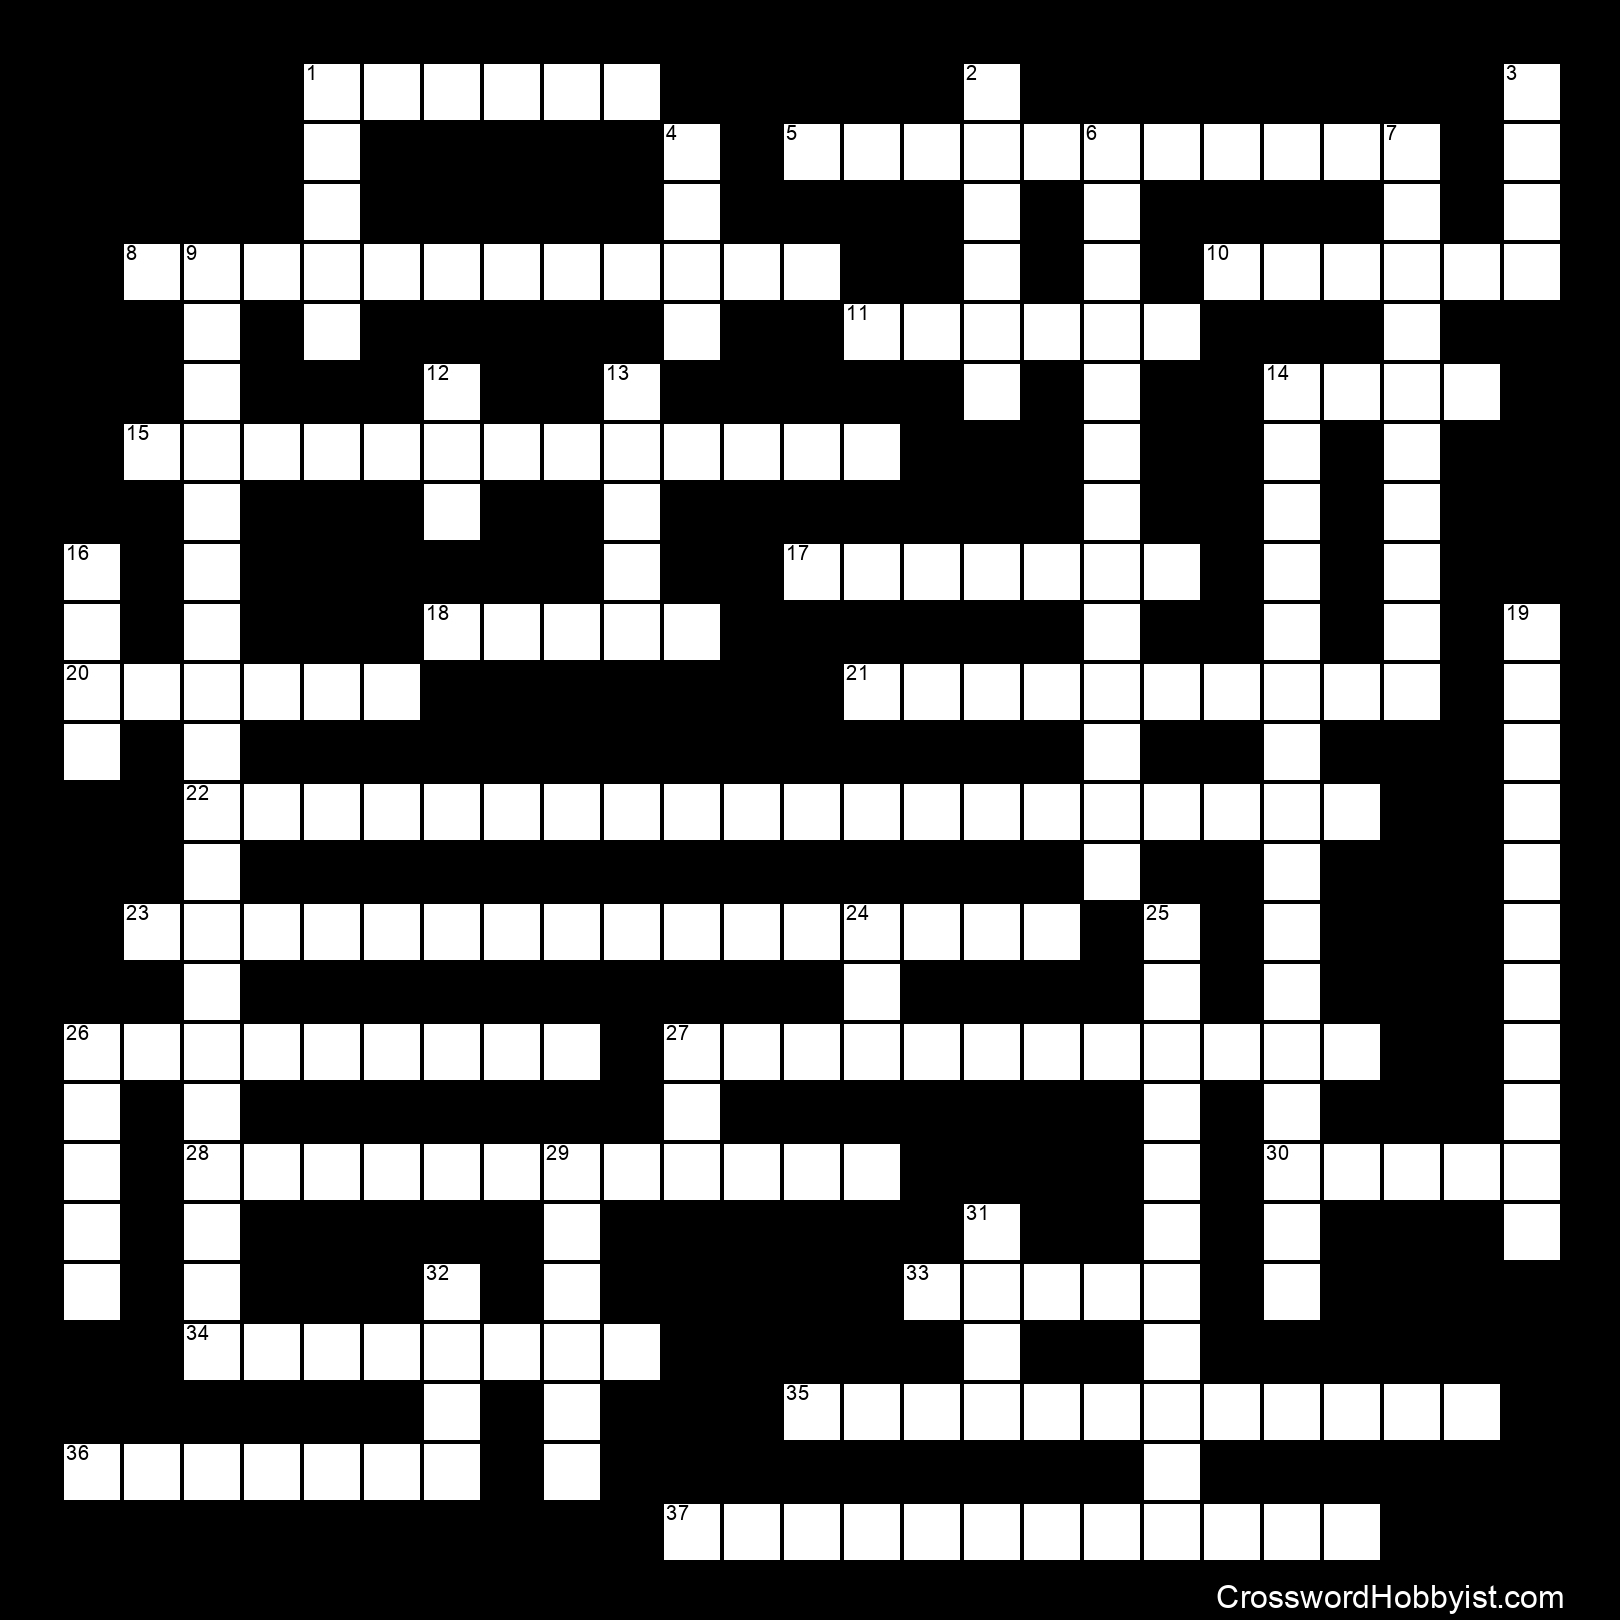 Recipe Crossword Puzzle - Universal Daily Crossword Puzzle Printable